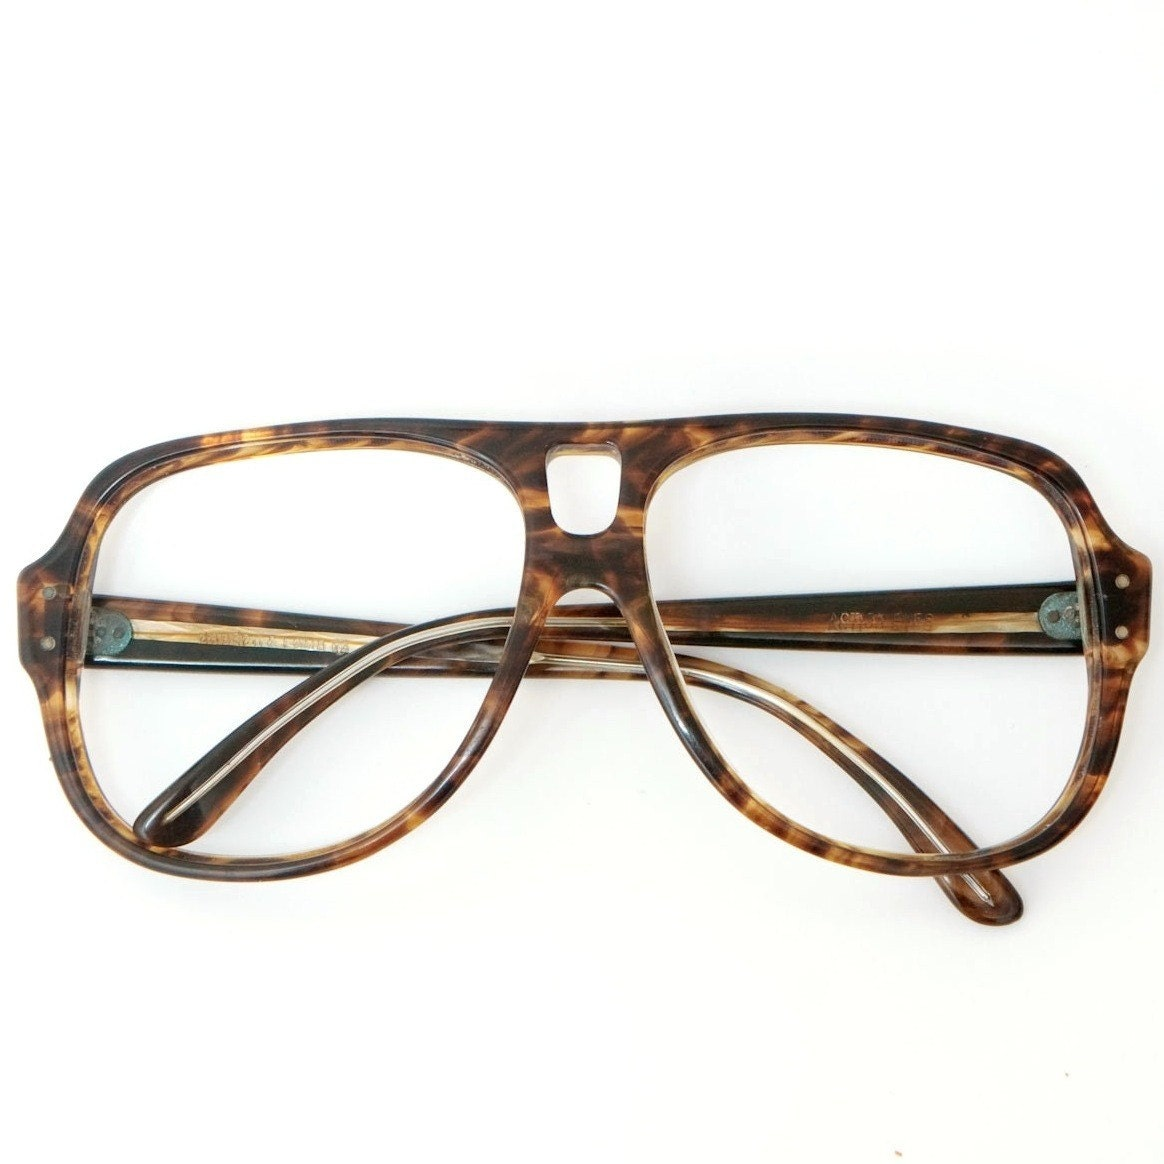 Big Frame Aviator Glasses : Big 70s Aviator Glasses Frames Bausch and Lomb / BL